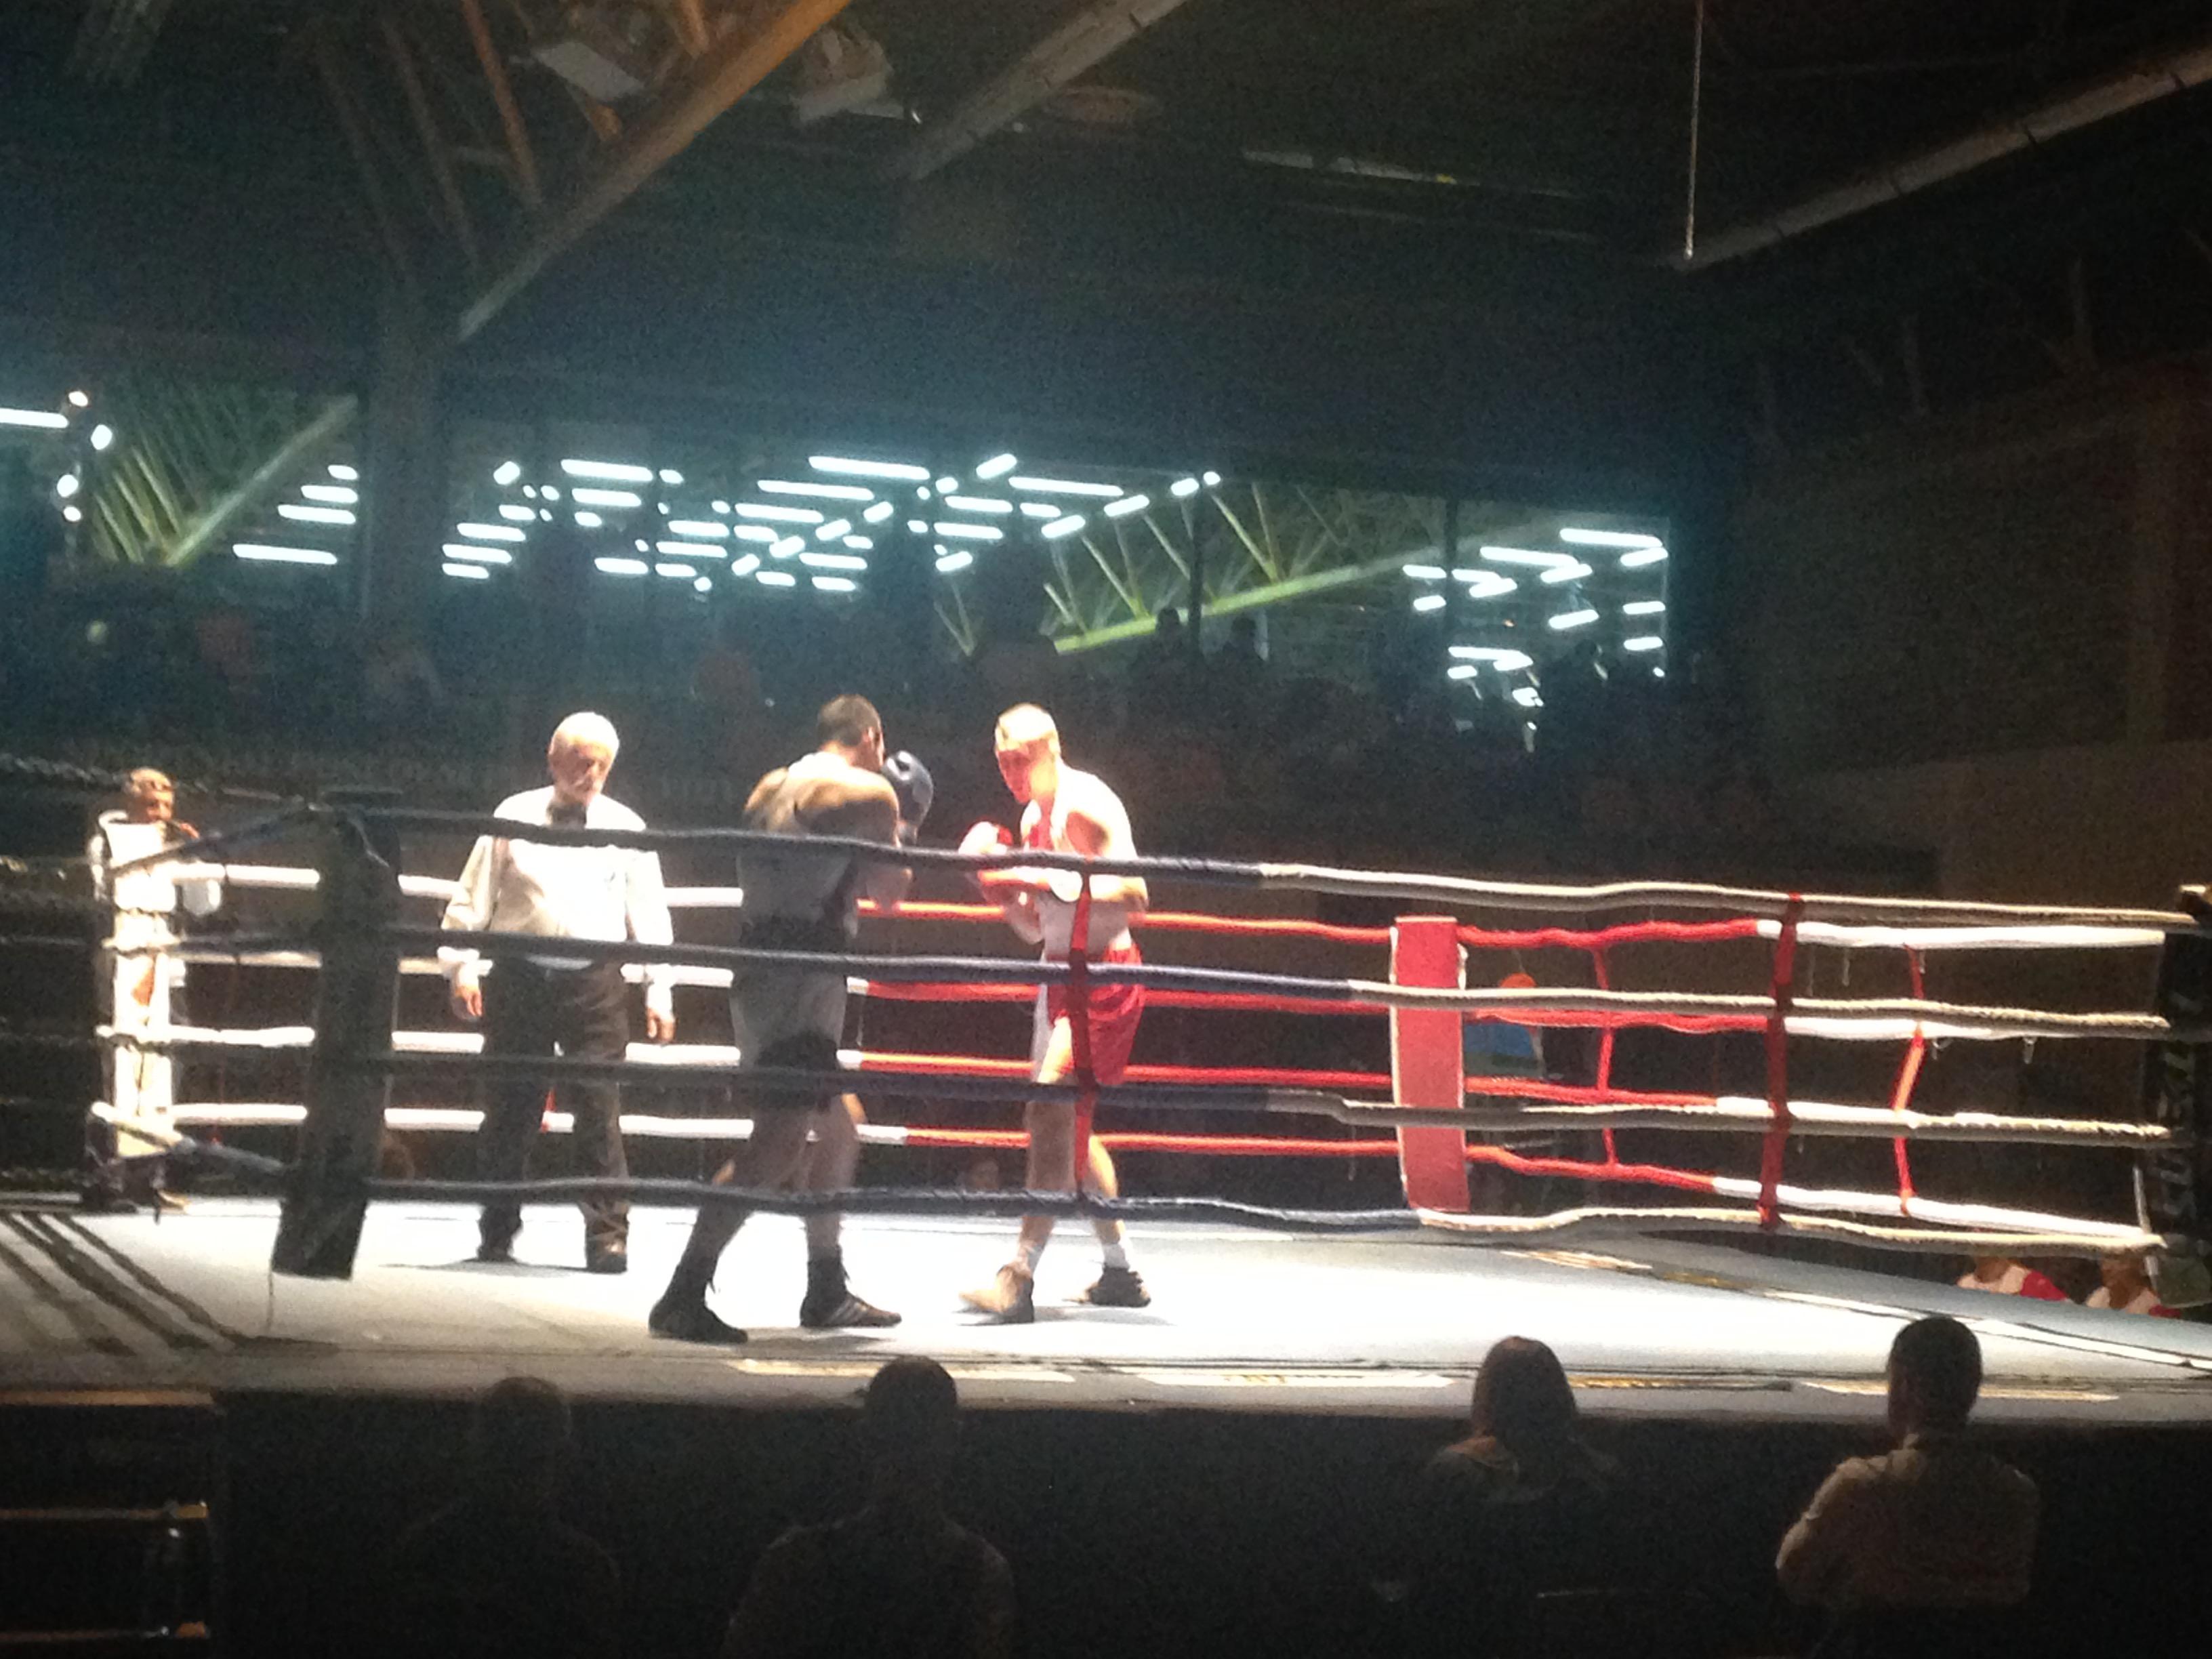 Praznik boksa u Novom Sadu